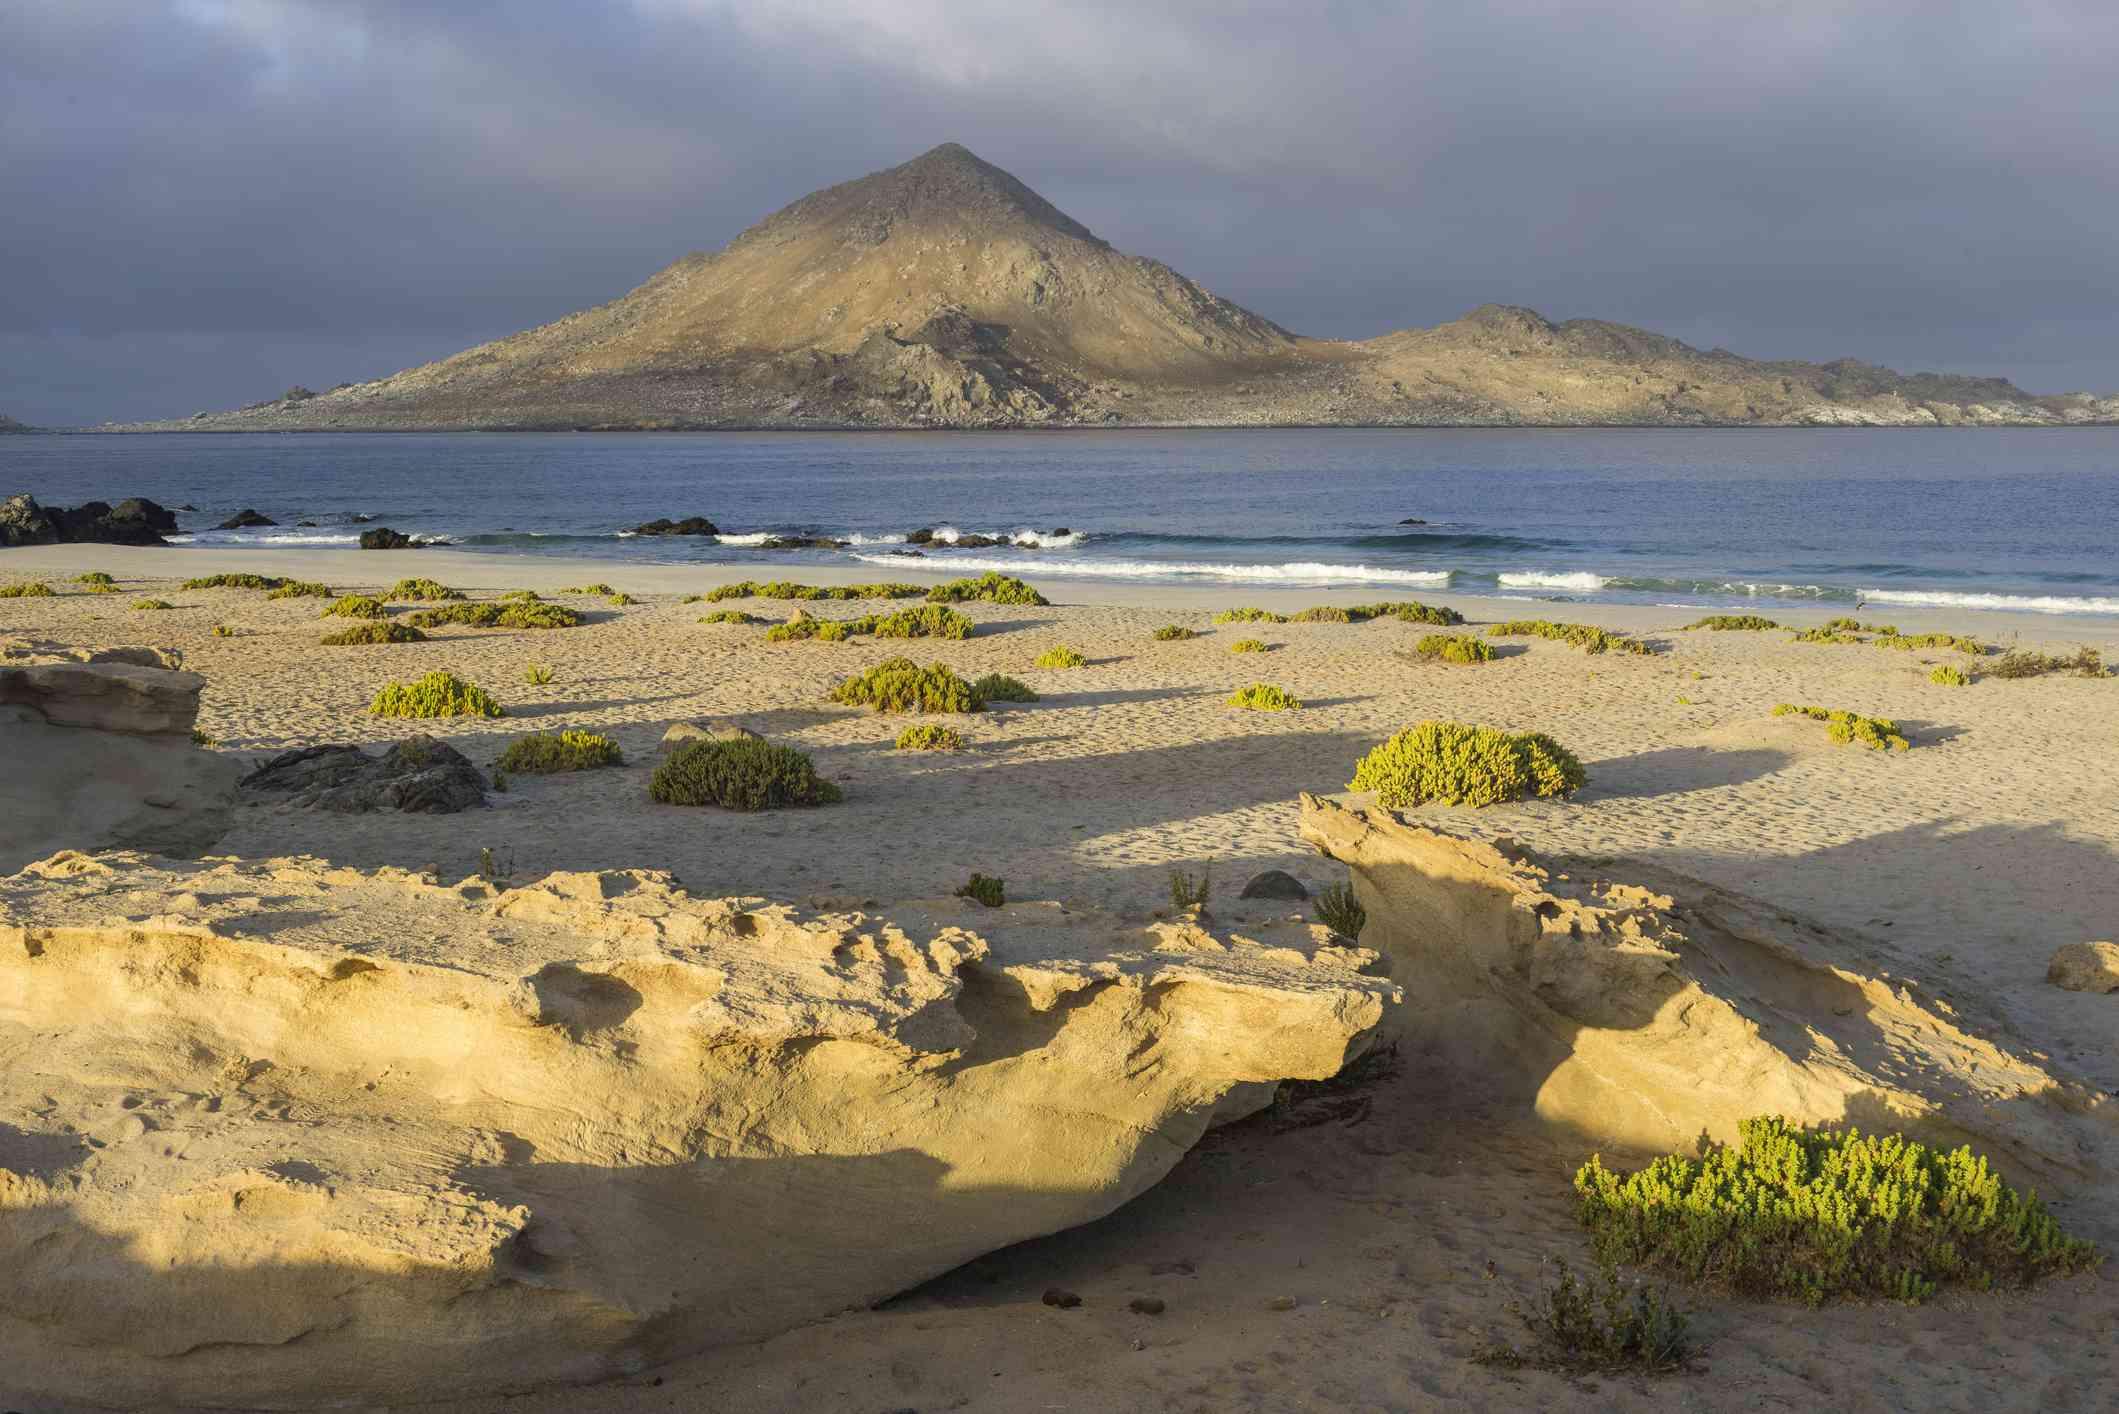 Coast in the morning light, Pan de Azucar National Park, Atacama Region, Chile